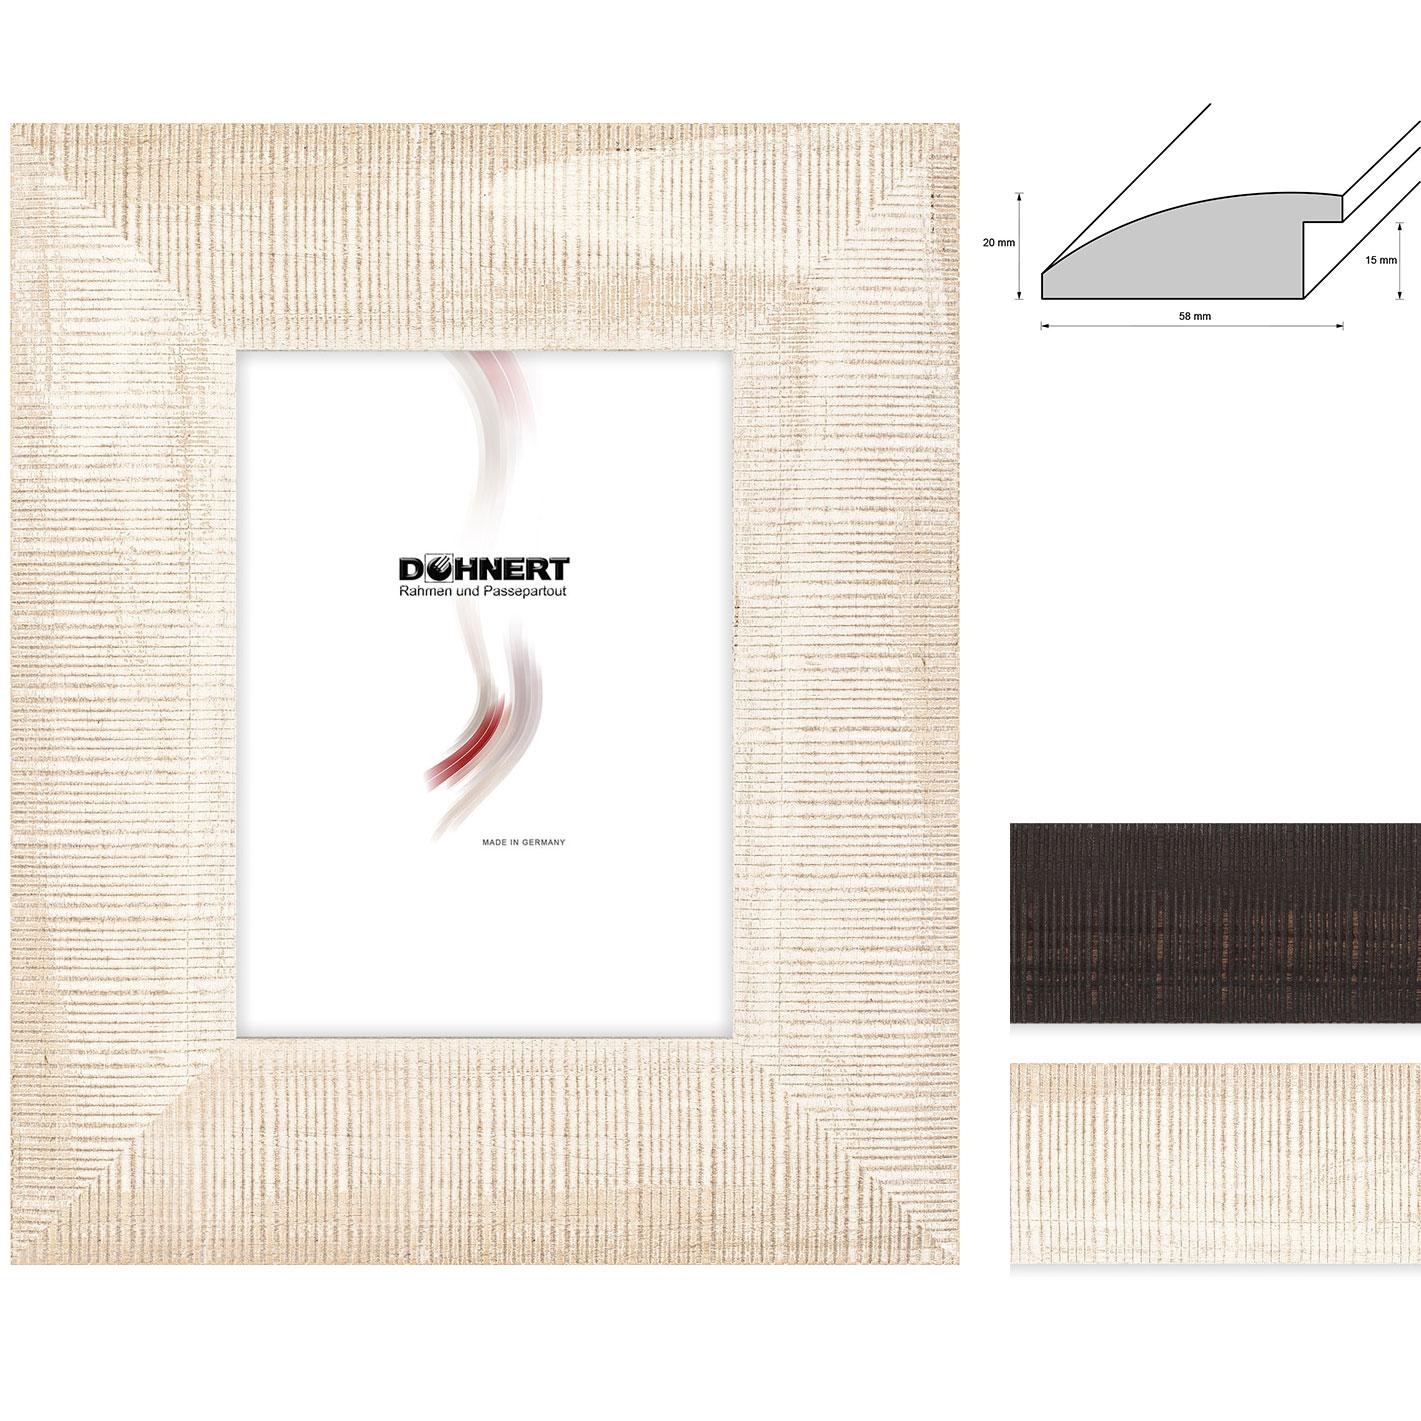 Doehnert marco de madera a medida stamford brook - Madera a medida ...